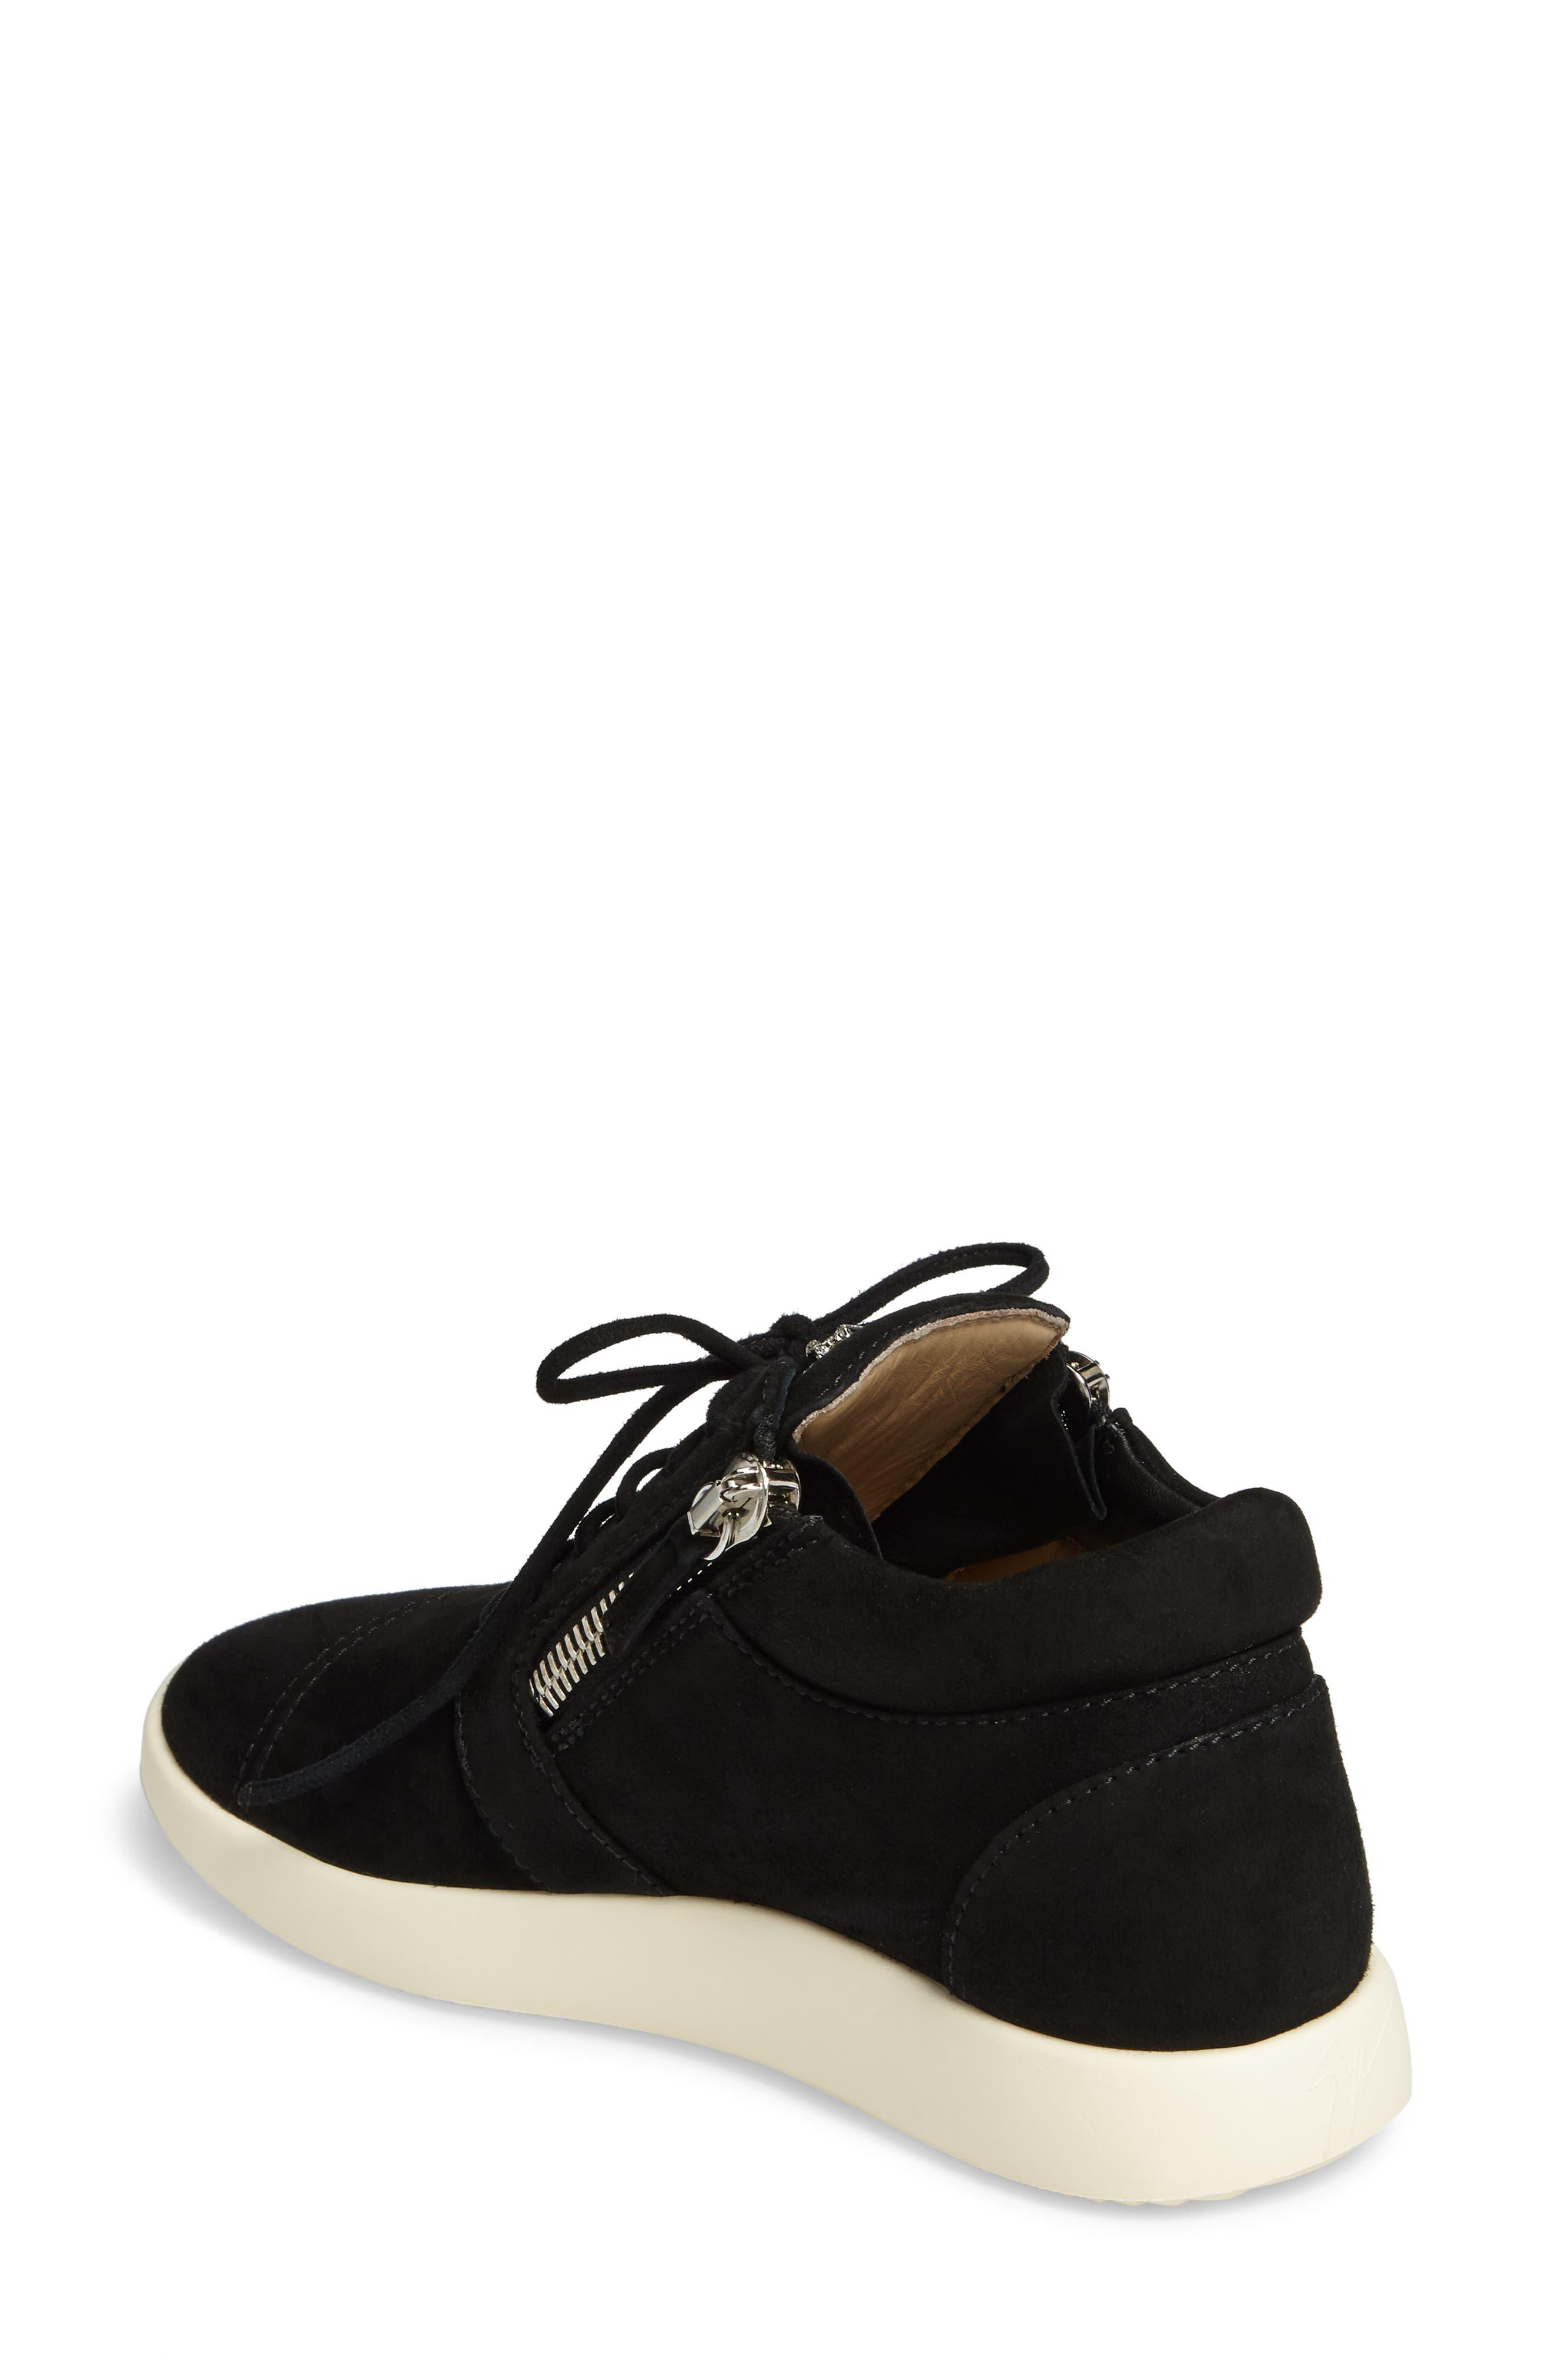 Zip Mid-Top Sneaker,                             Alternate thumbnail 2, color,                             001